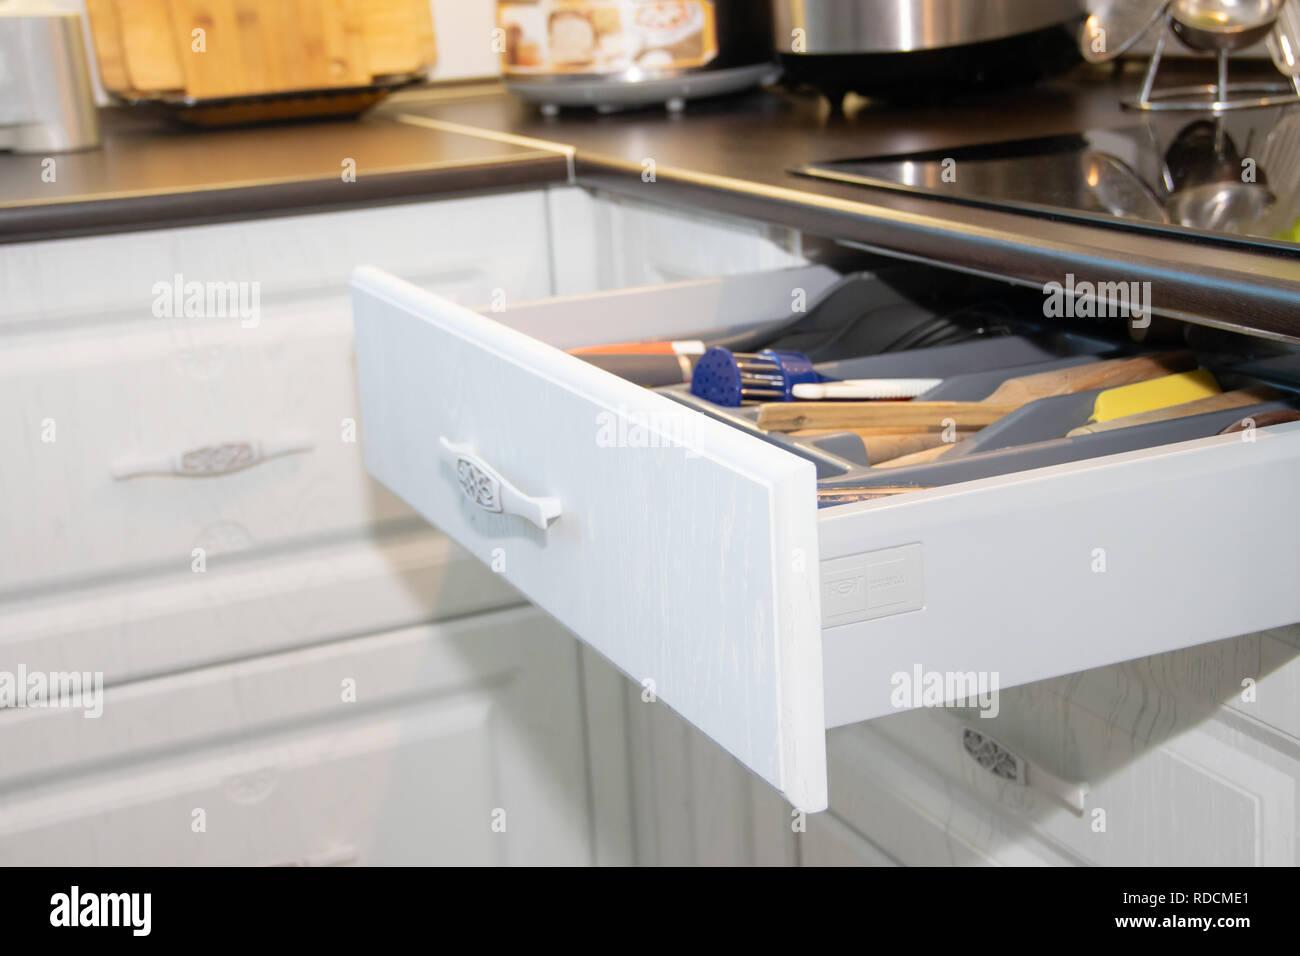 Cucina bianca. Cucina in legno. Arredamento moderno e la cucina ...